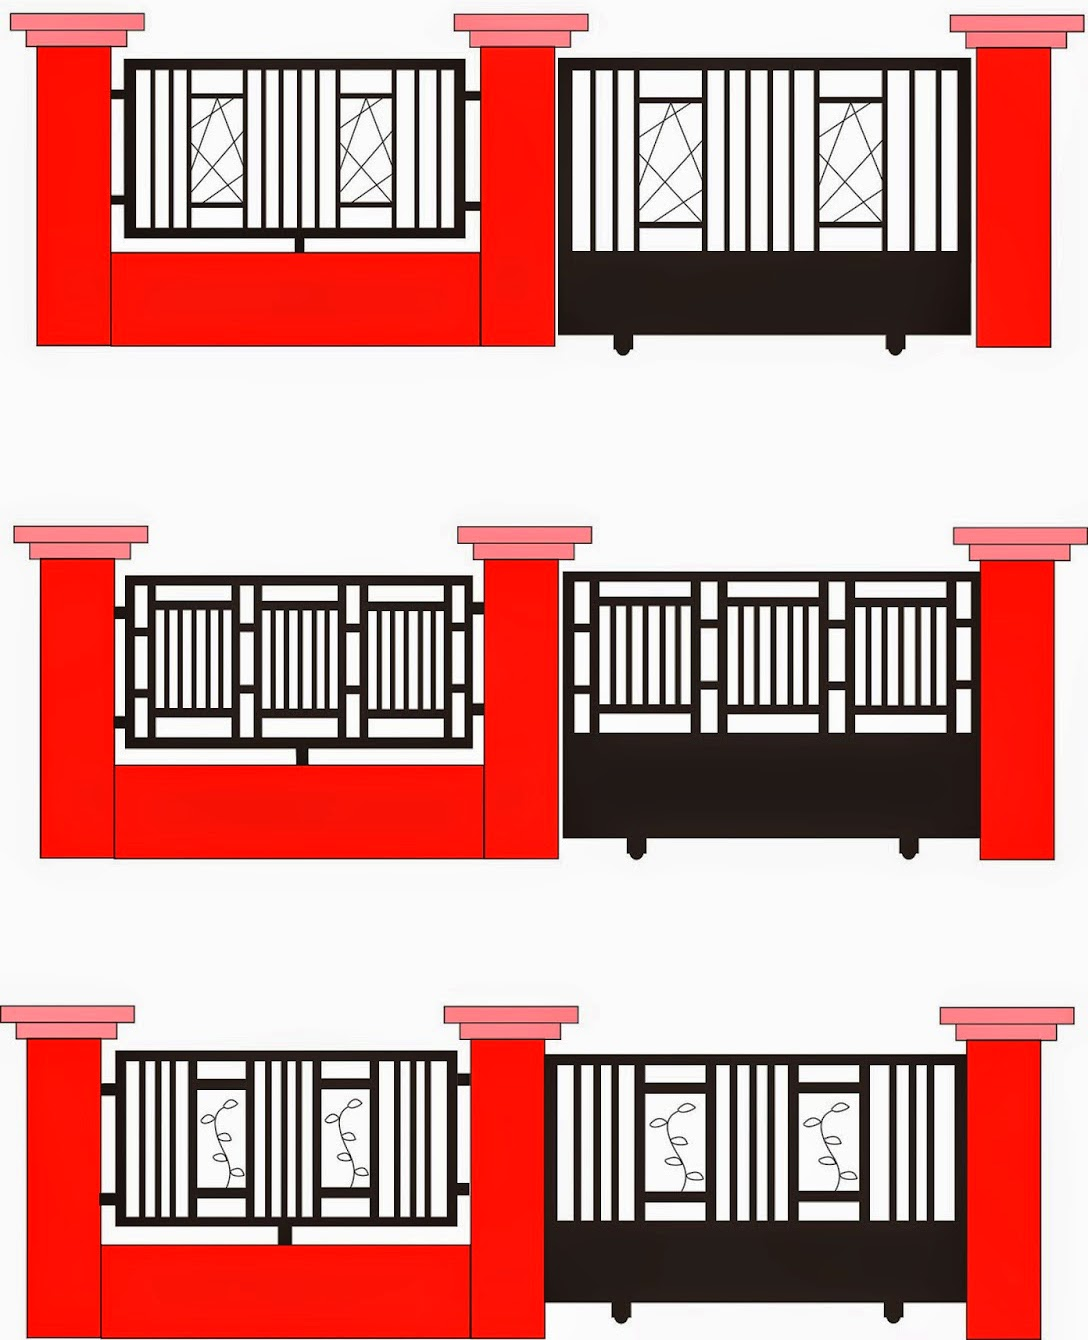 Pagar Hollow Minimalis : pagar, hollow, minimalis, Menghitung, Pagar, Hollow